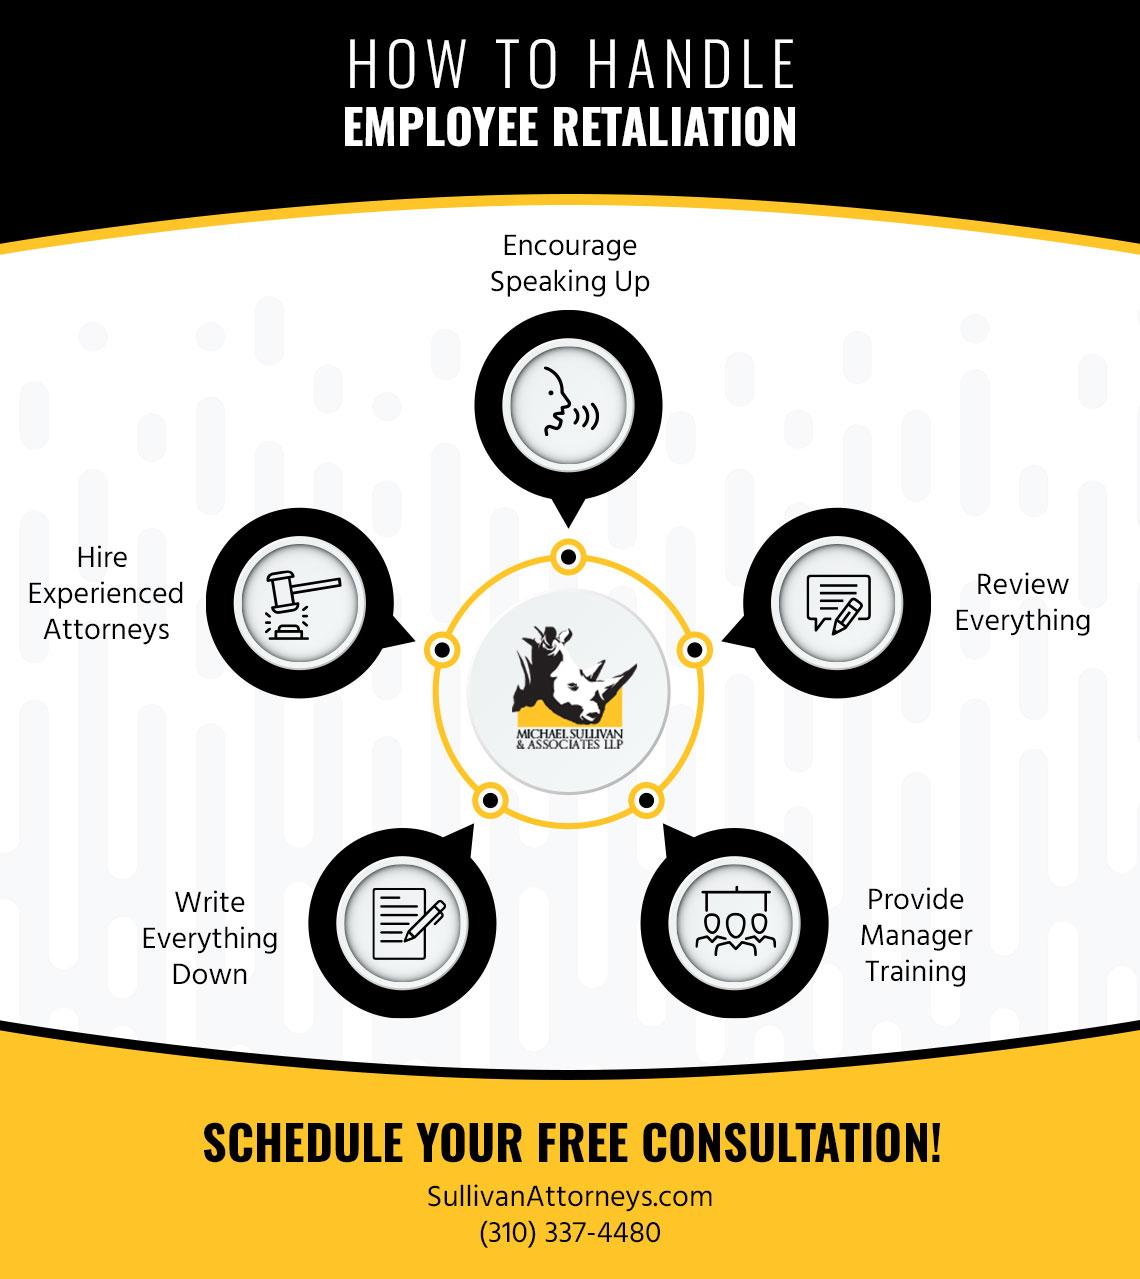 How To Handle Employee Retaliation